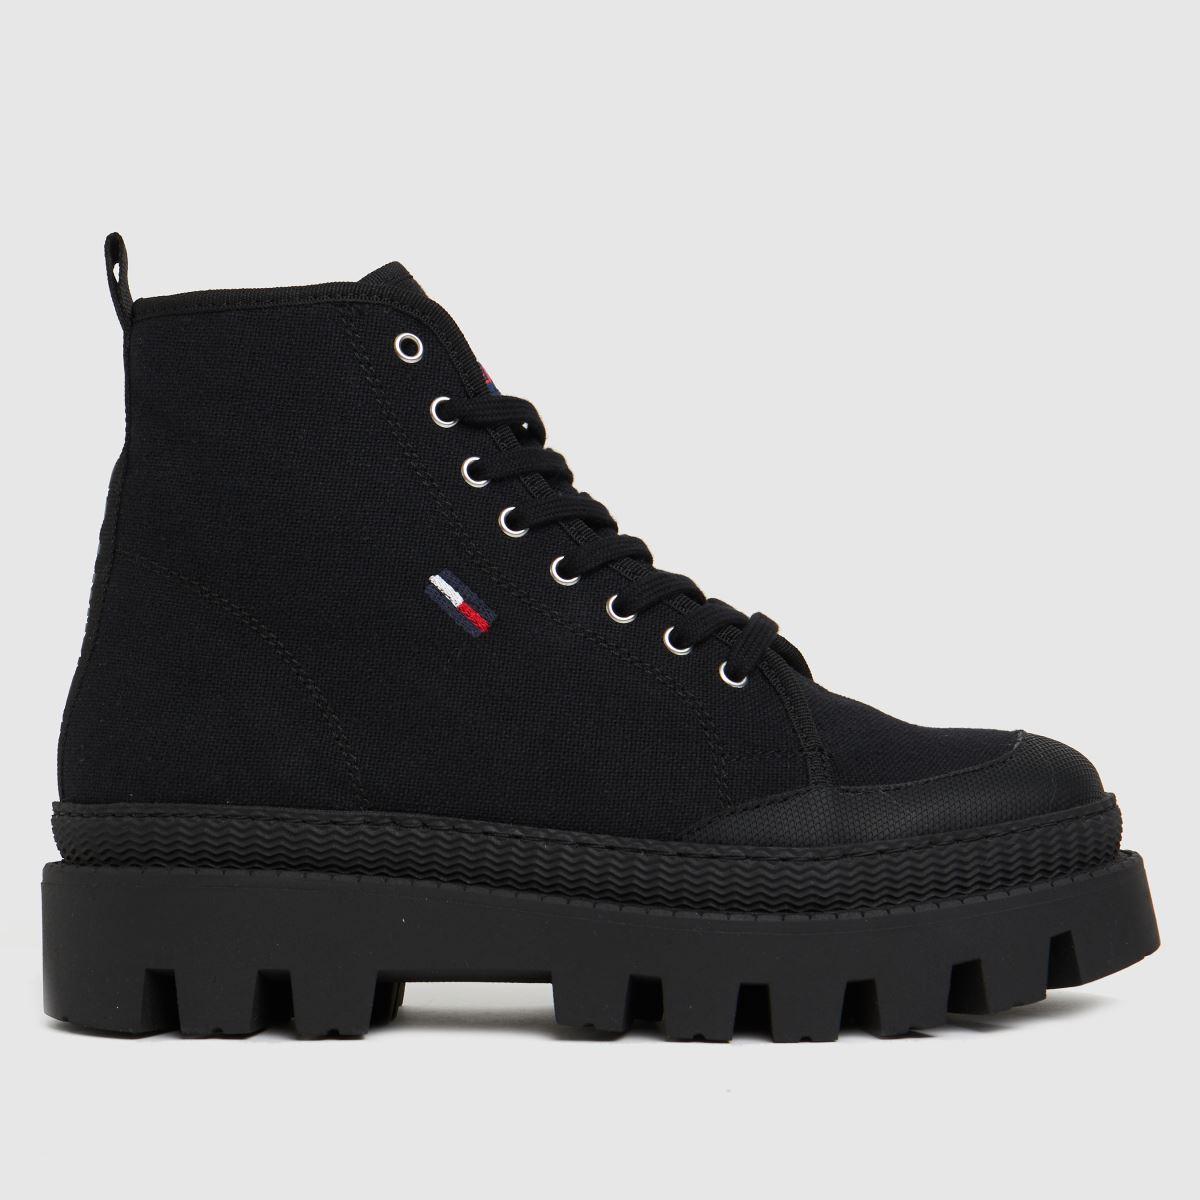 Tommy Hilfiger Black Flat Boots